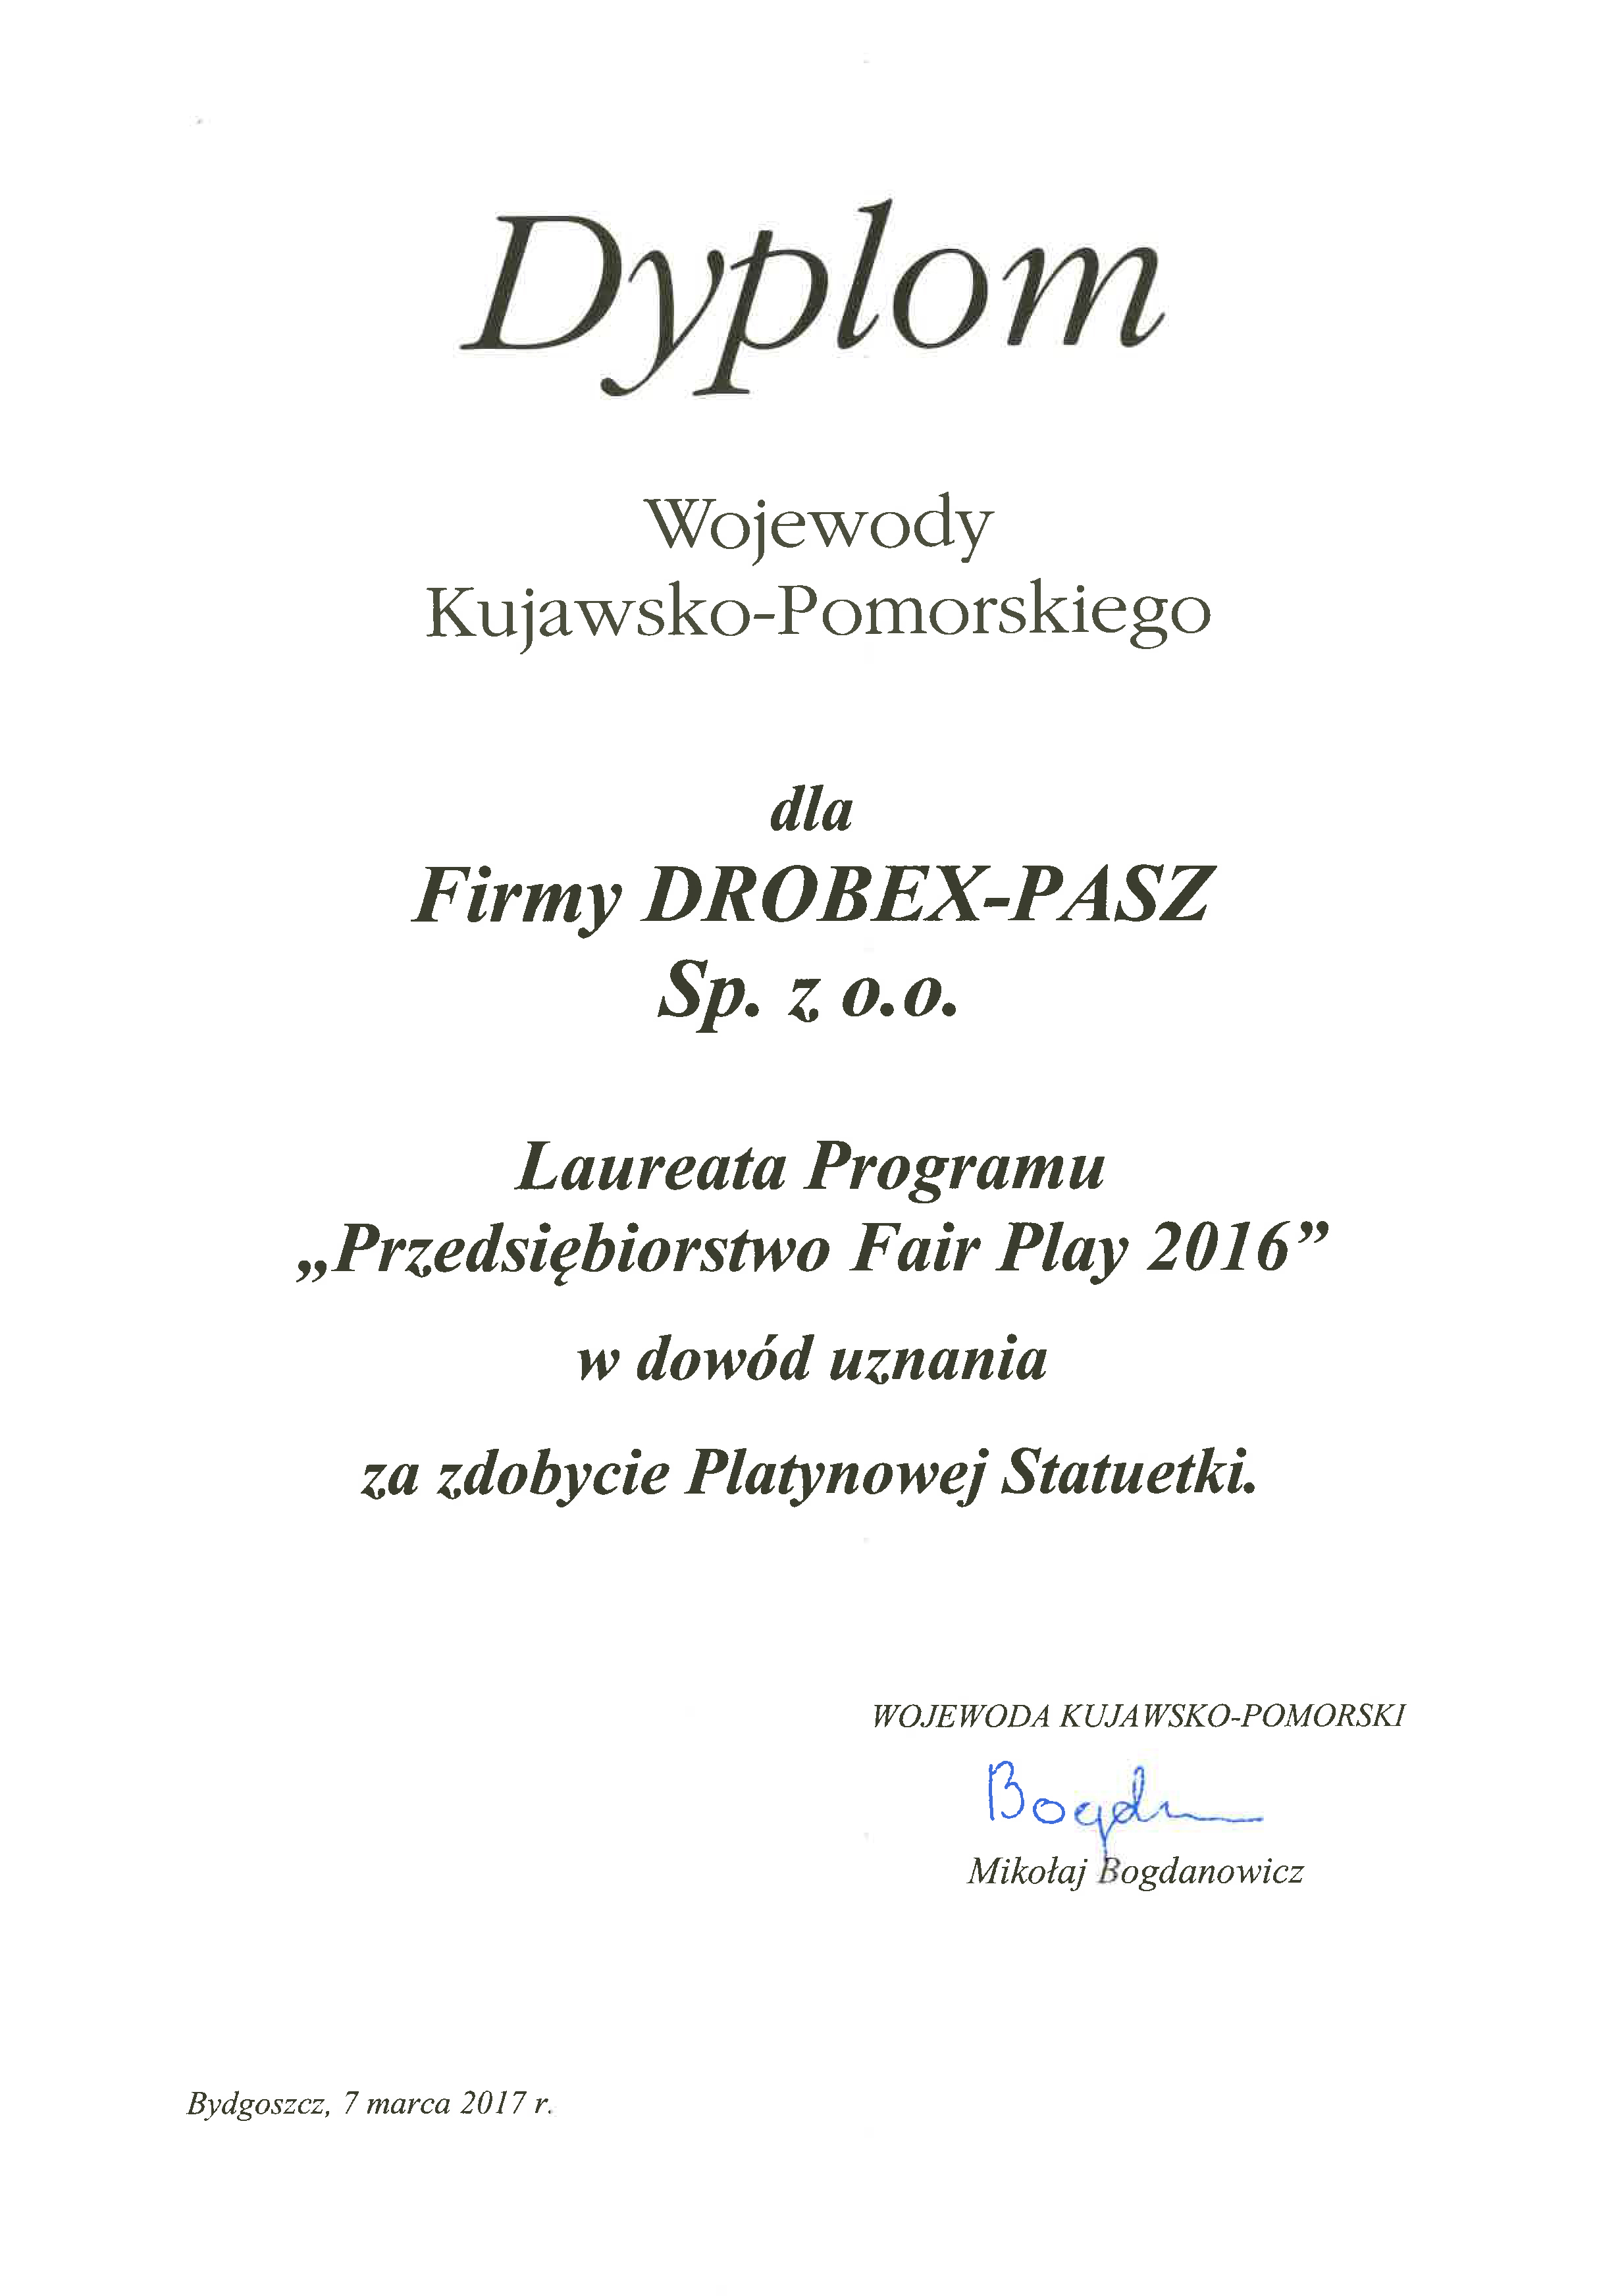 dyplom-DP-06